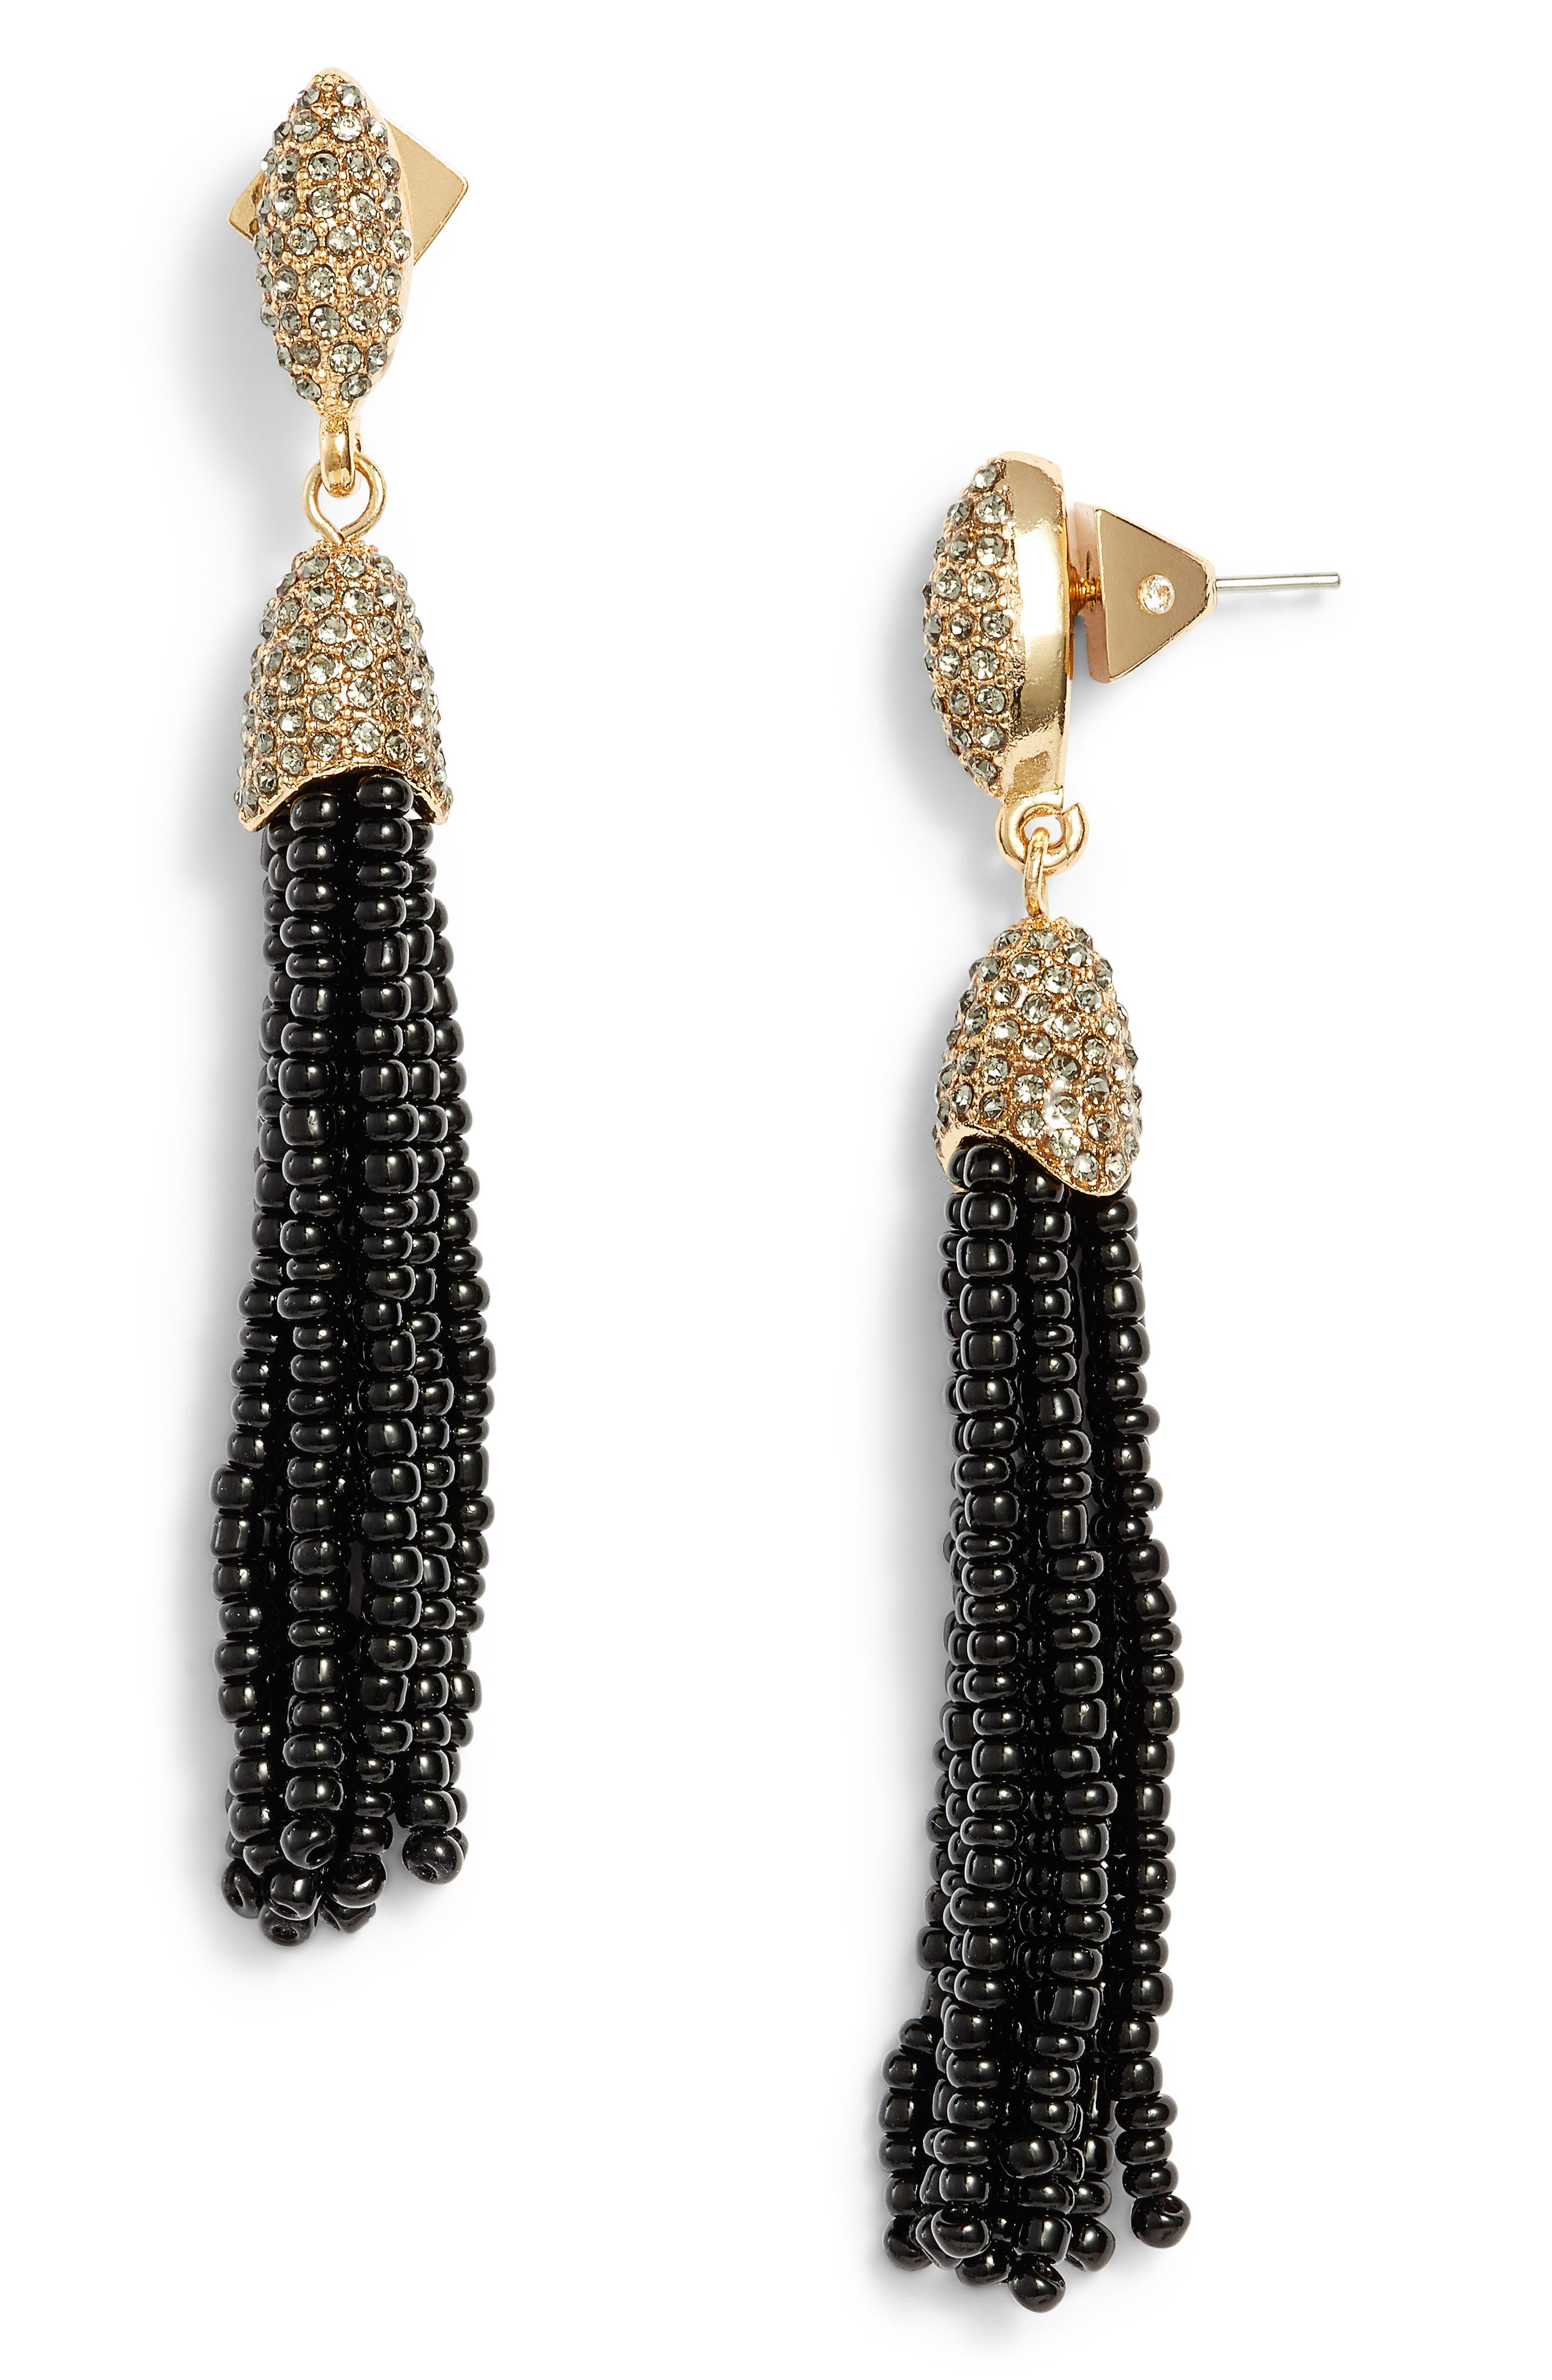 Seed Bead Tassel Earrings,                             Main thumbnail 1, color,                             710